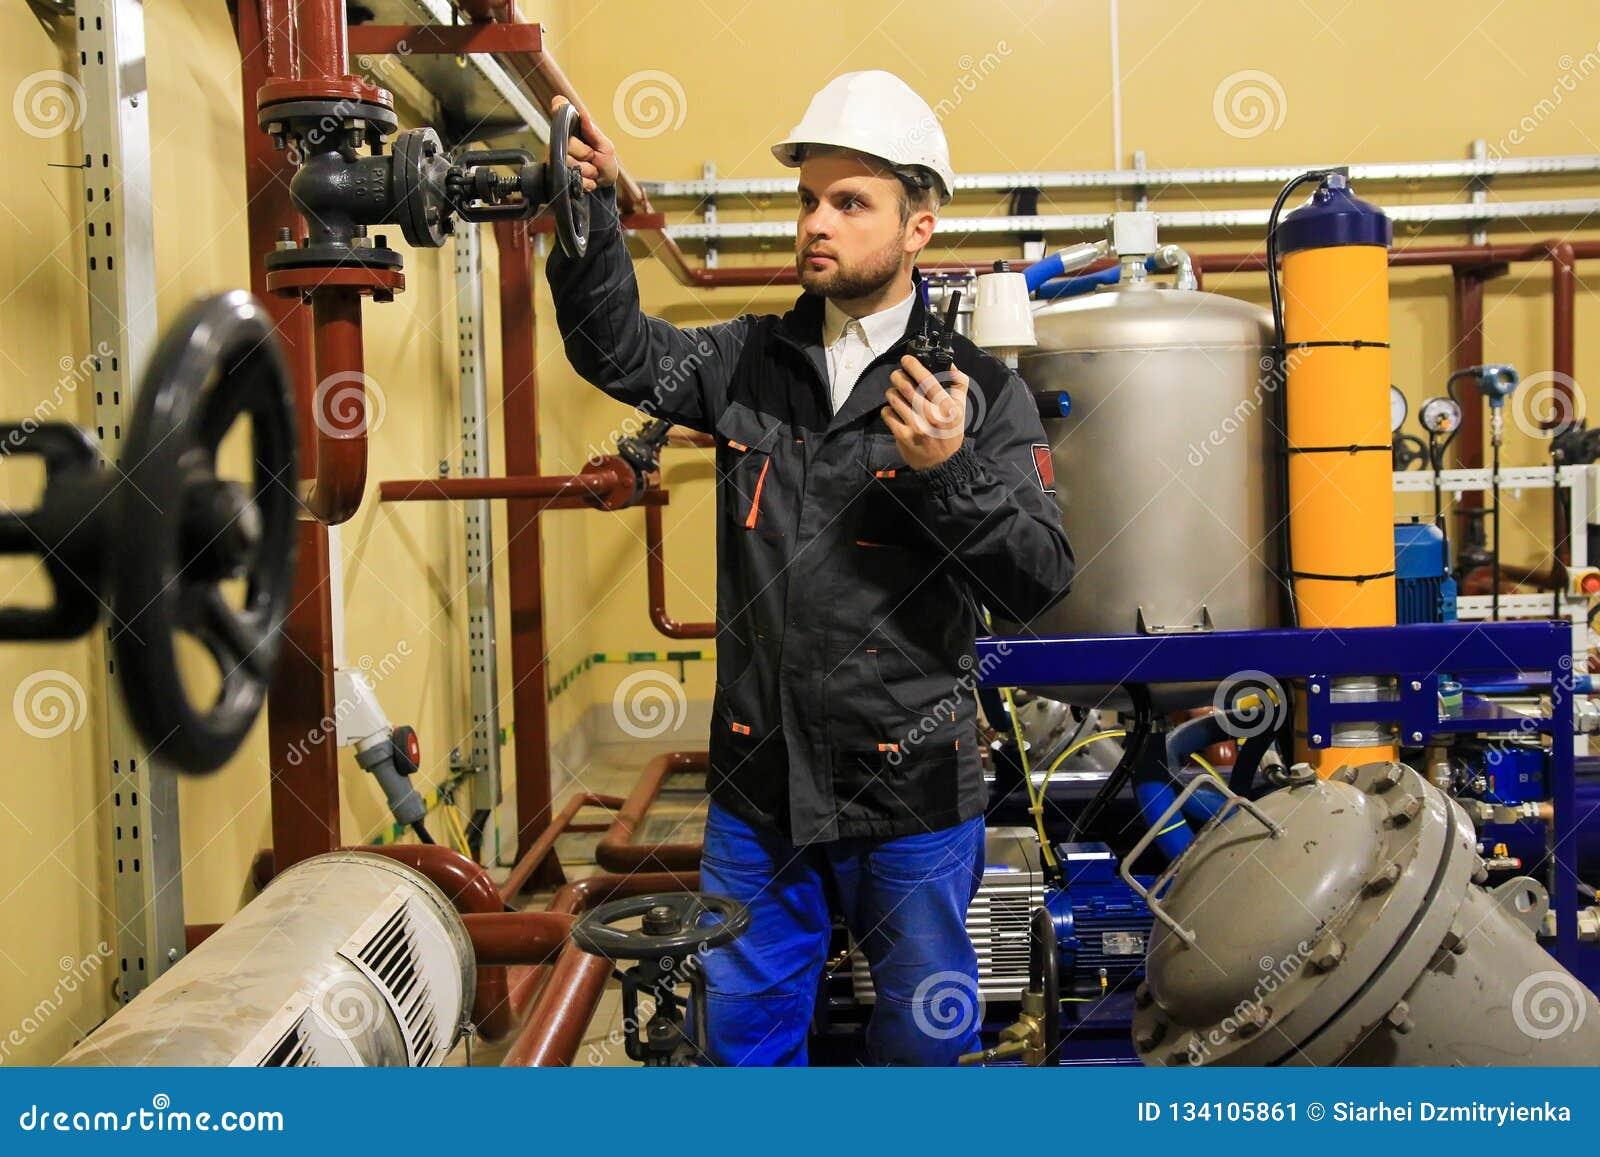 Technician engineer opens gate valve of pipeline on oil refinery